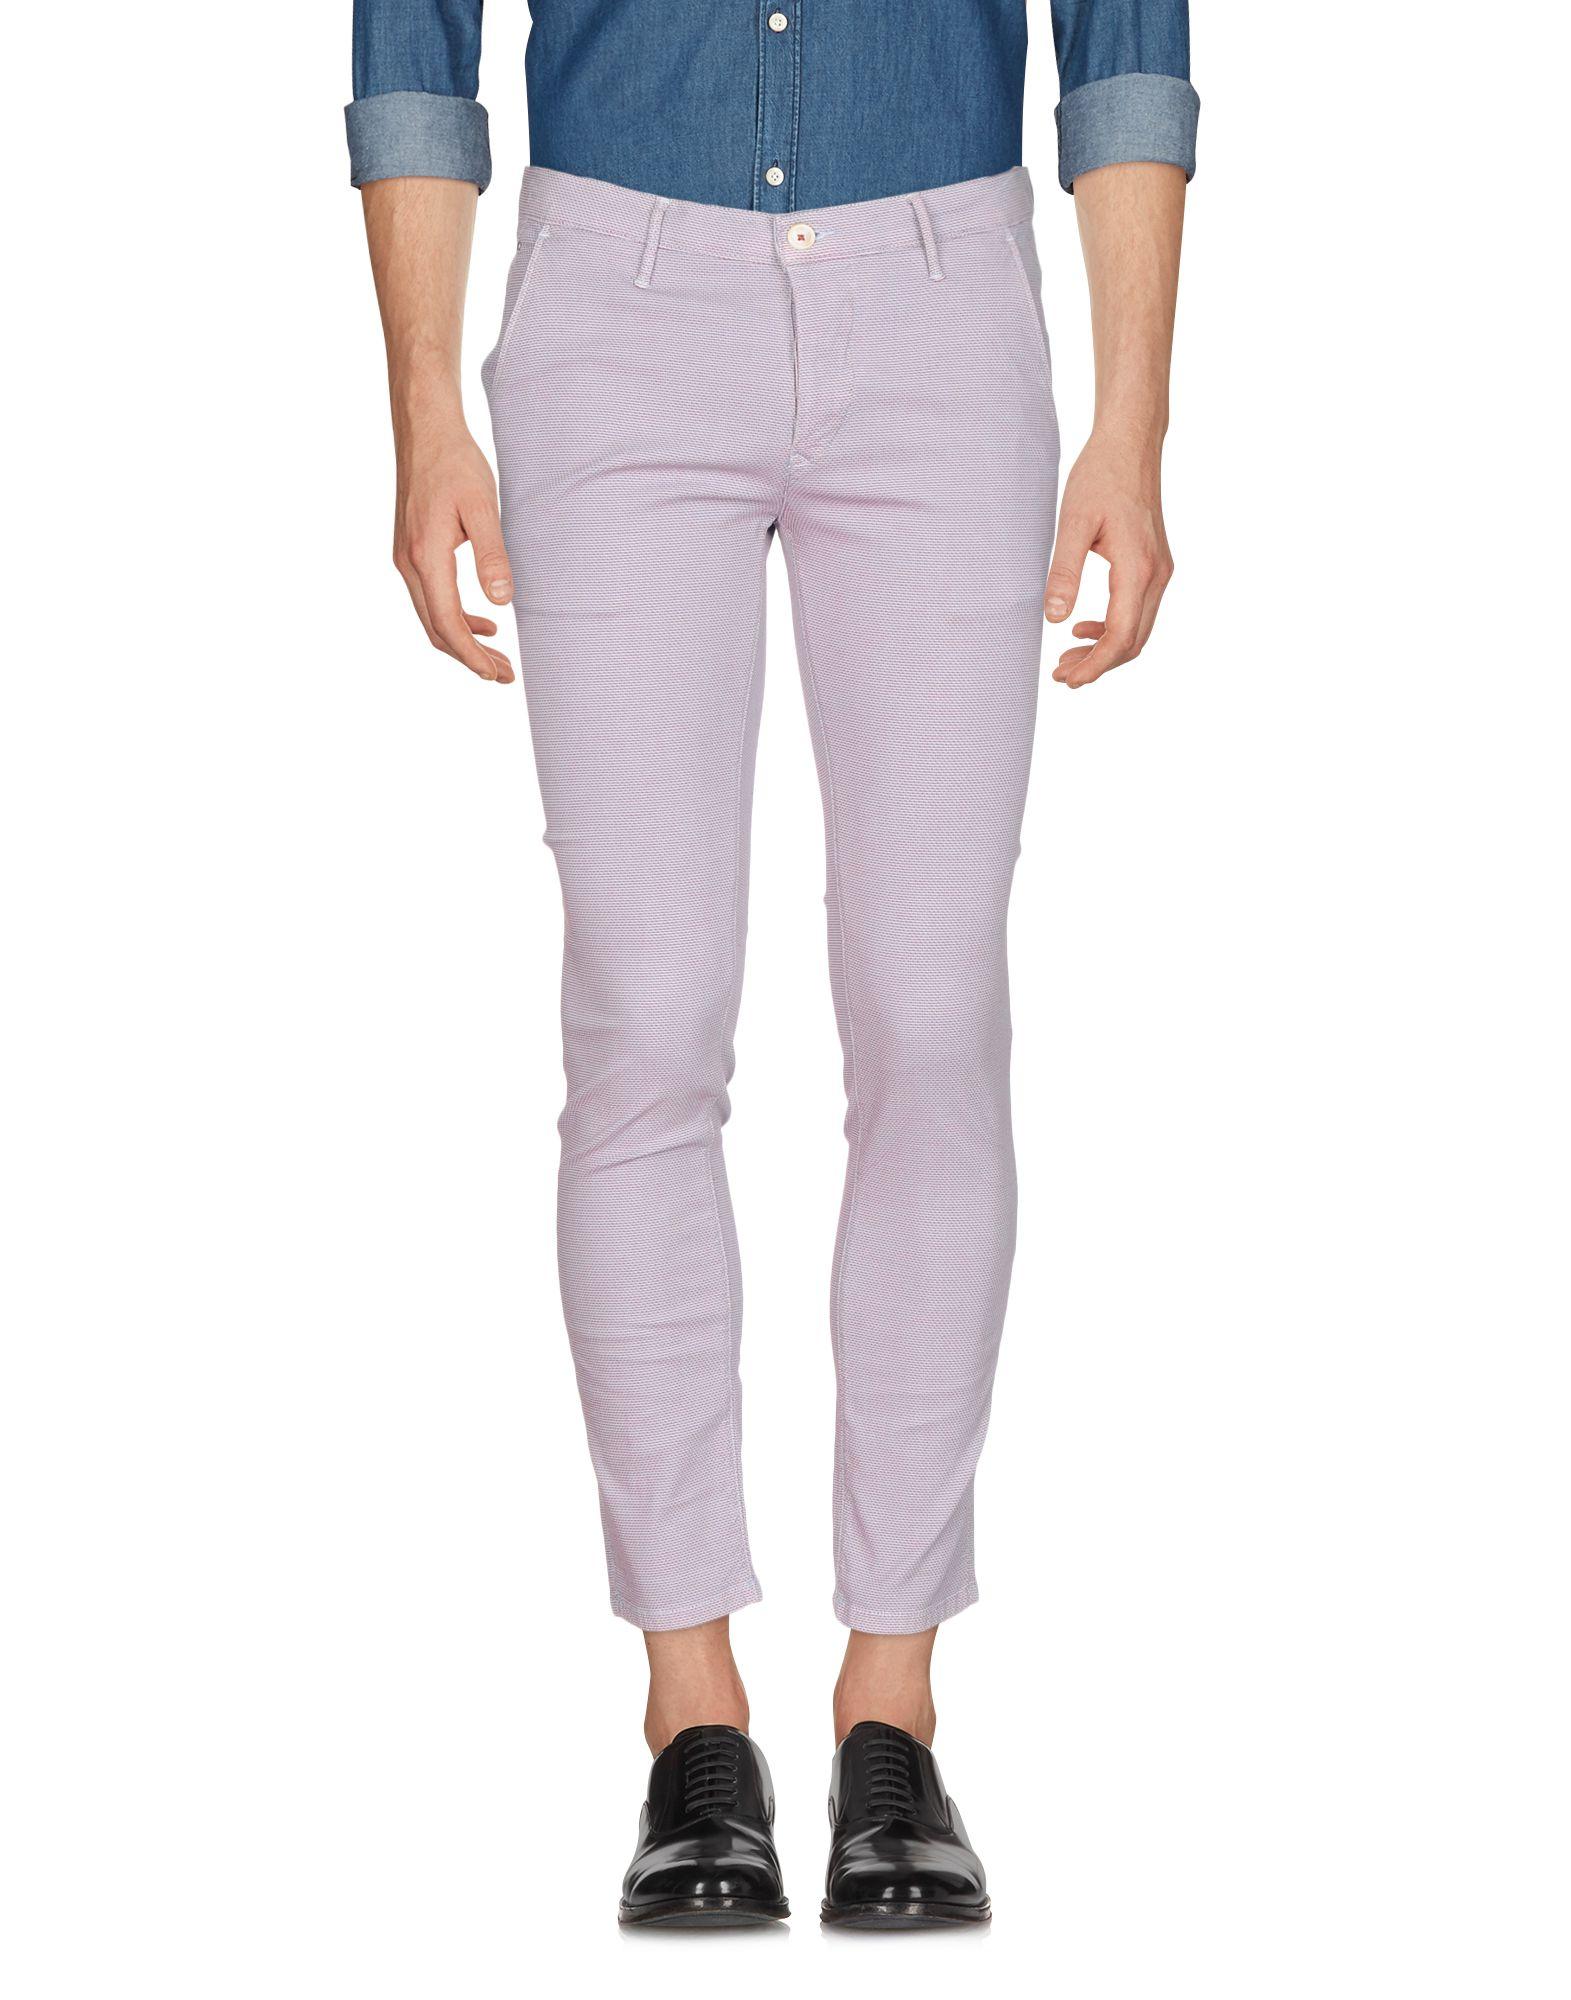 0/ZERO CONSTRUCTION Повседневные брюки 19 70 genuine wear повседневные брюки